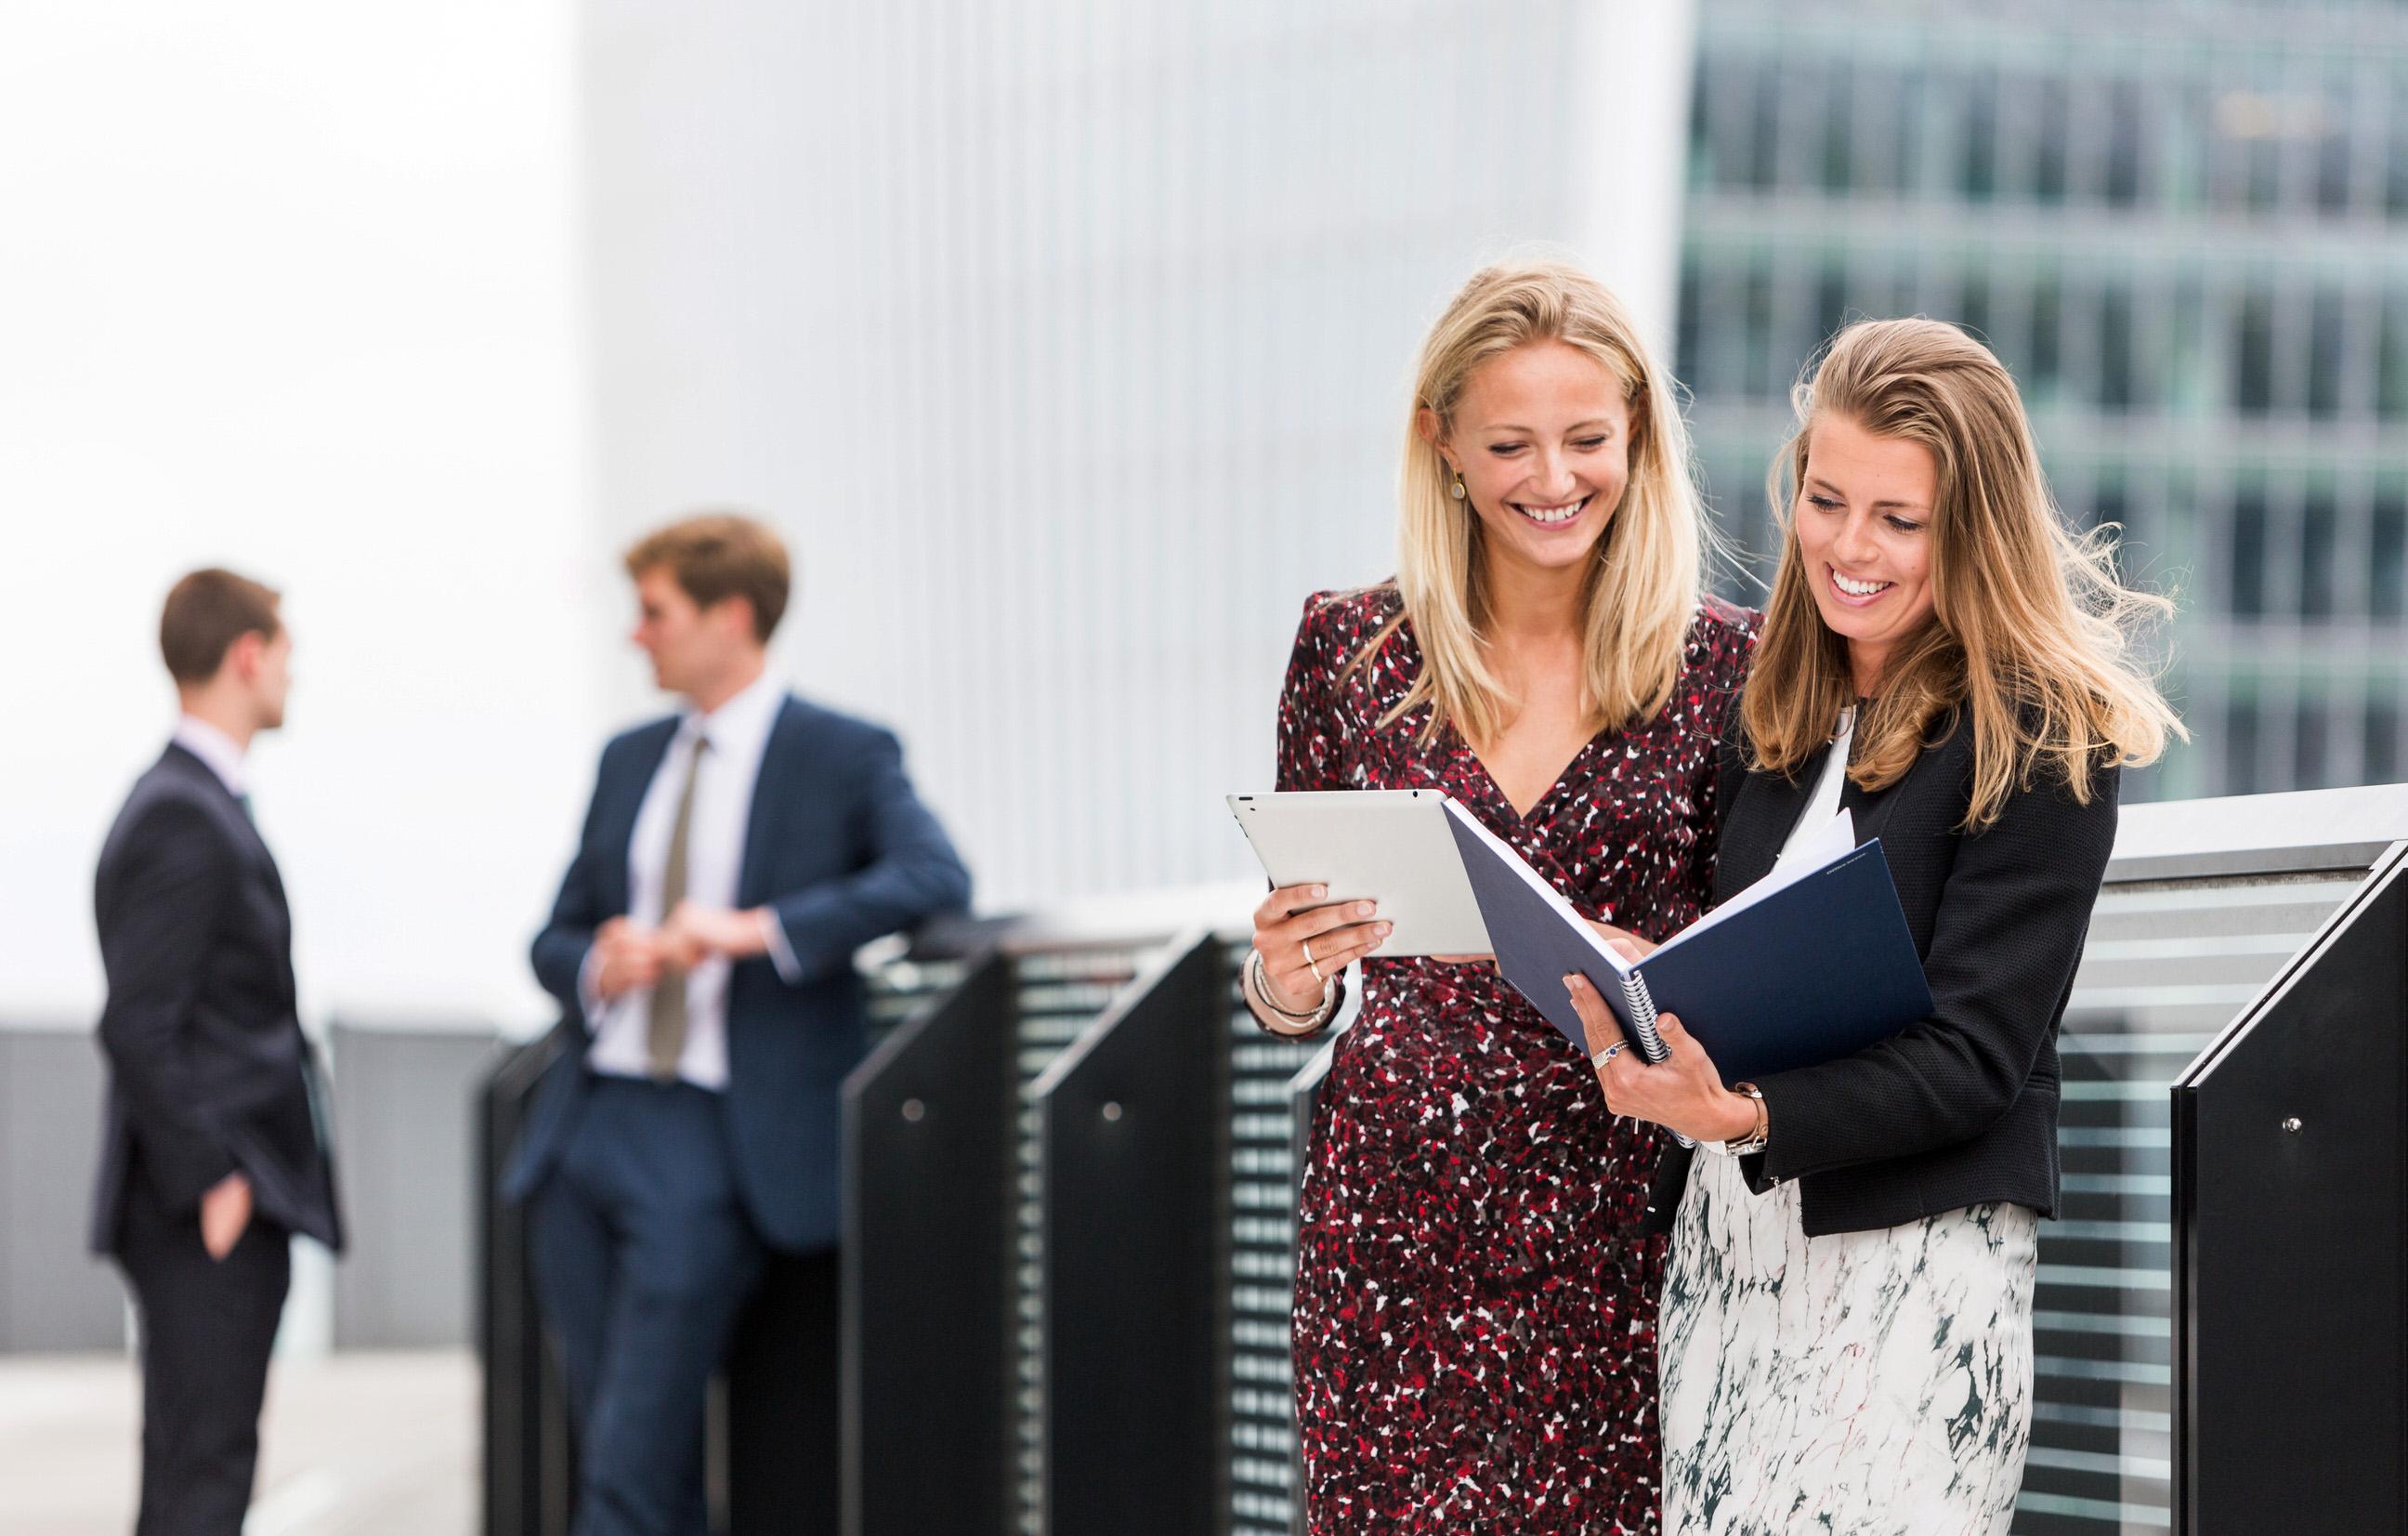 Willis Towers Watson Graduate Programmes and Apprenticeships